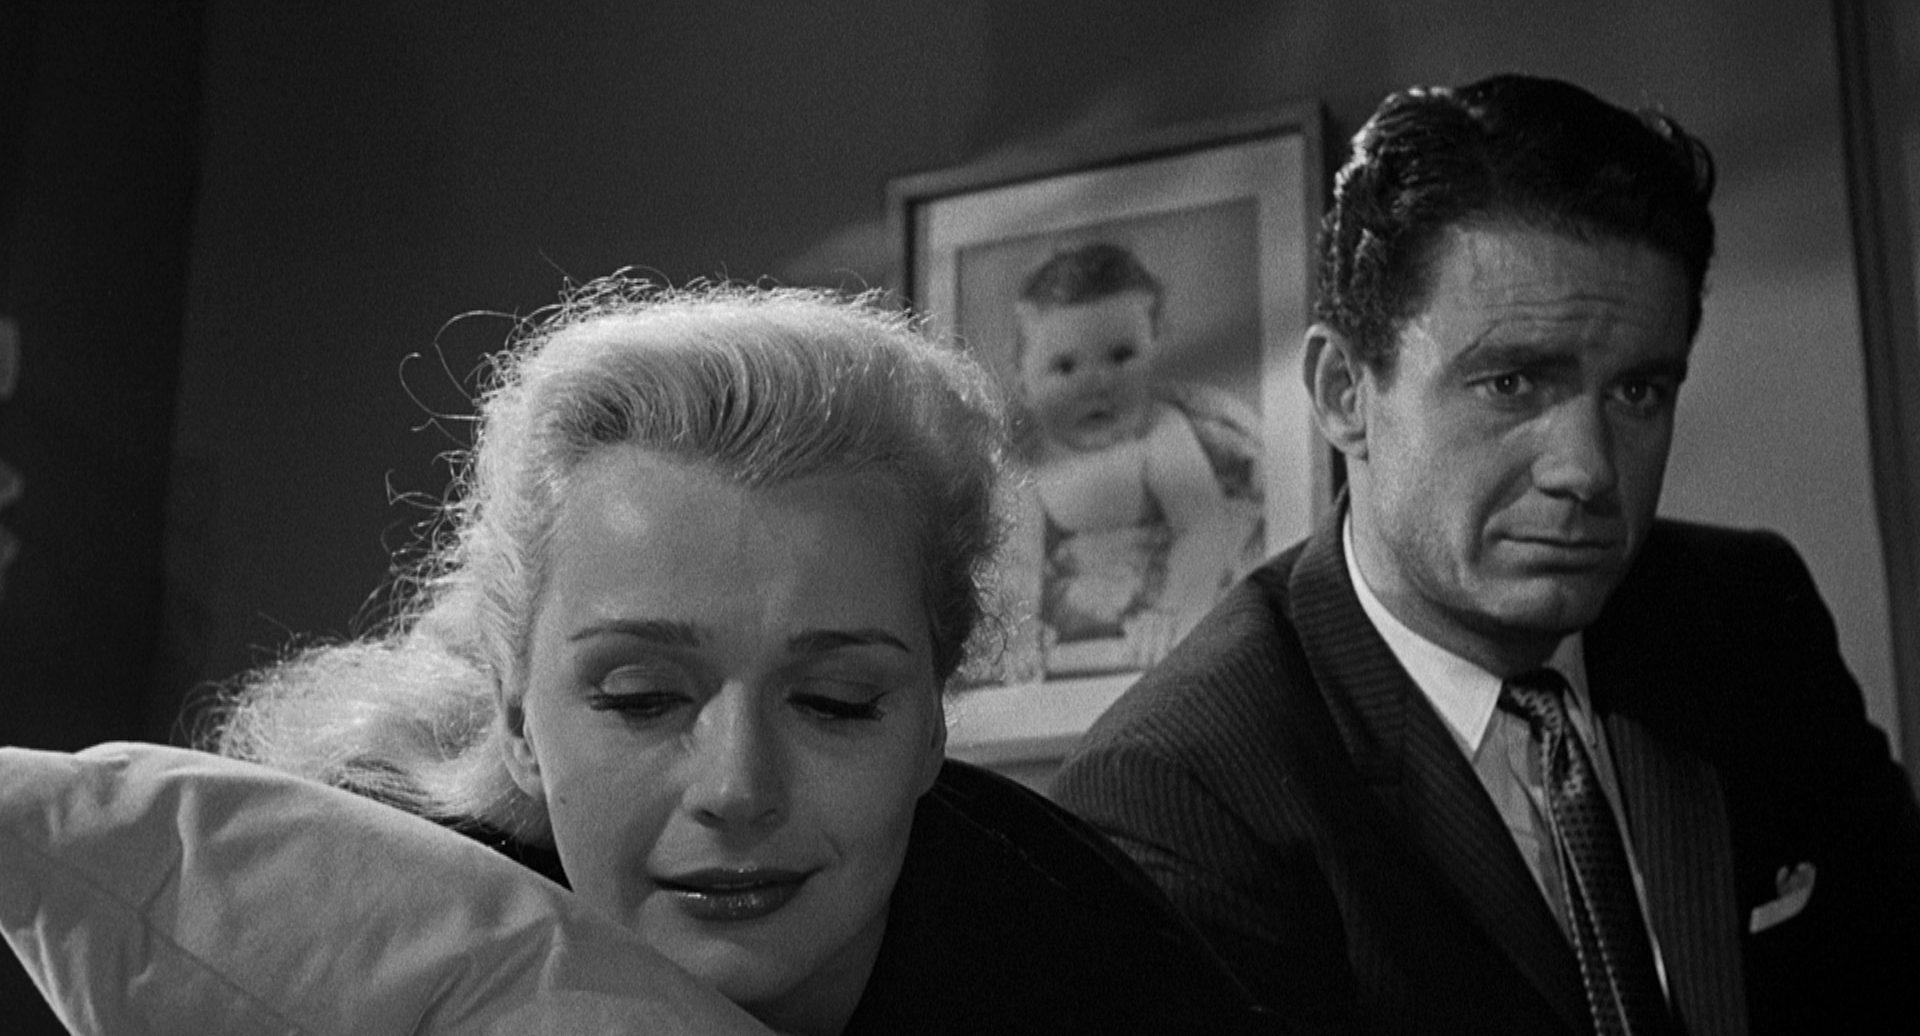 Szene aus 'Alles auf eine Karte(1961)', Copyright: Columbia Pictures